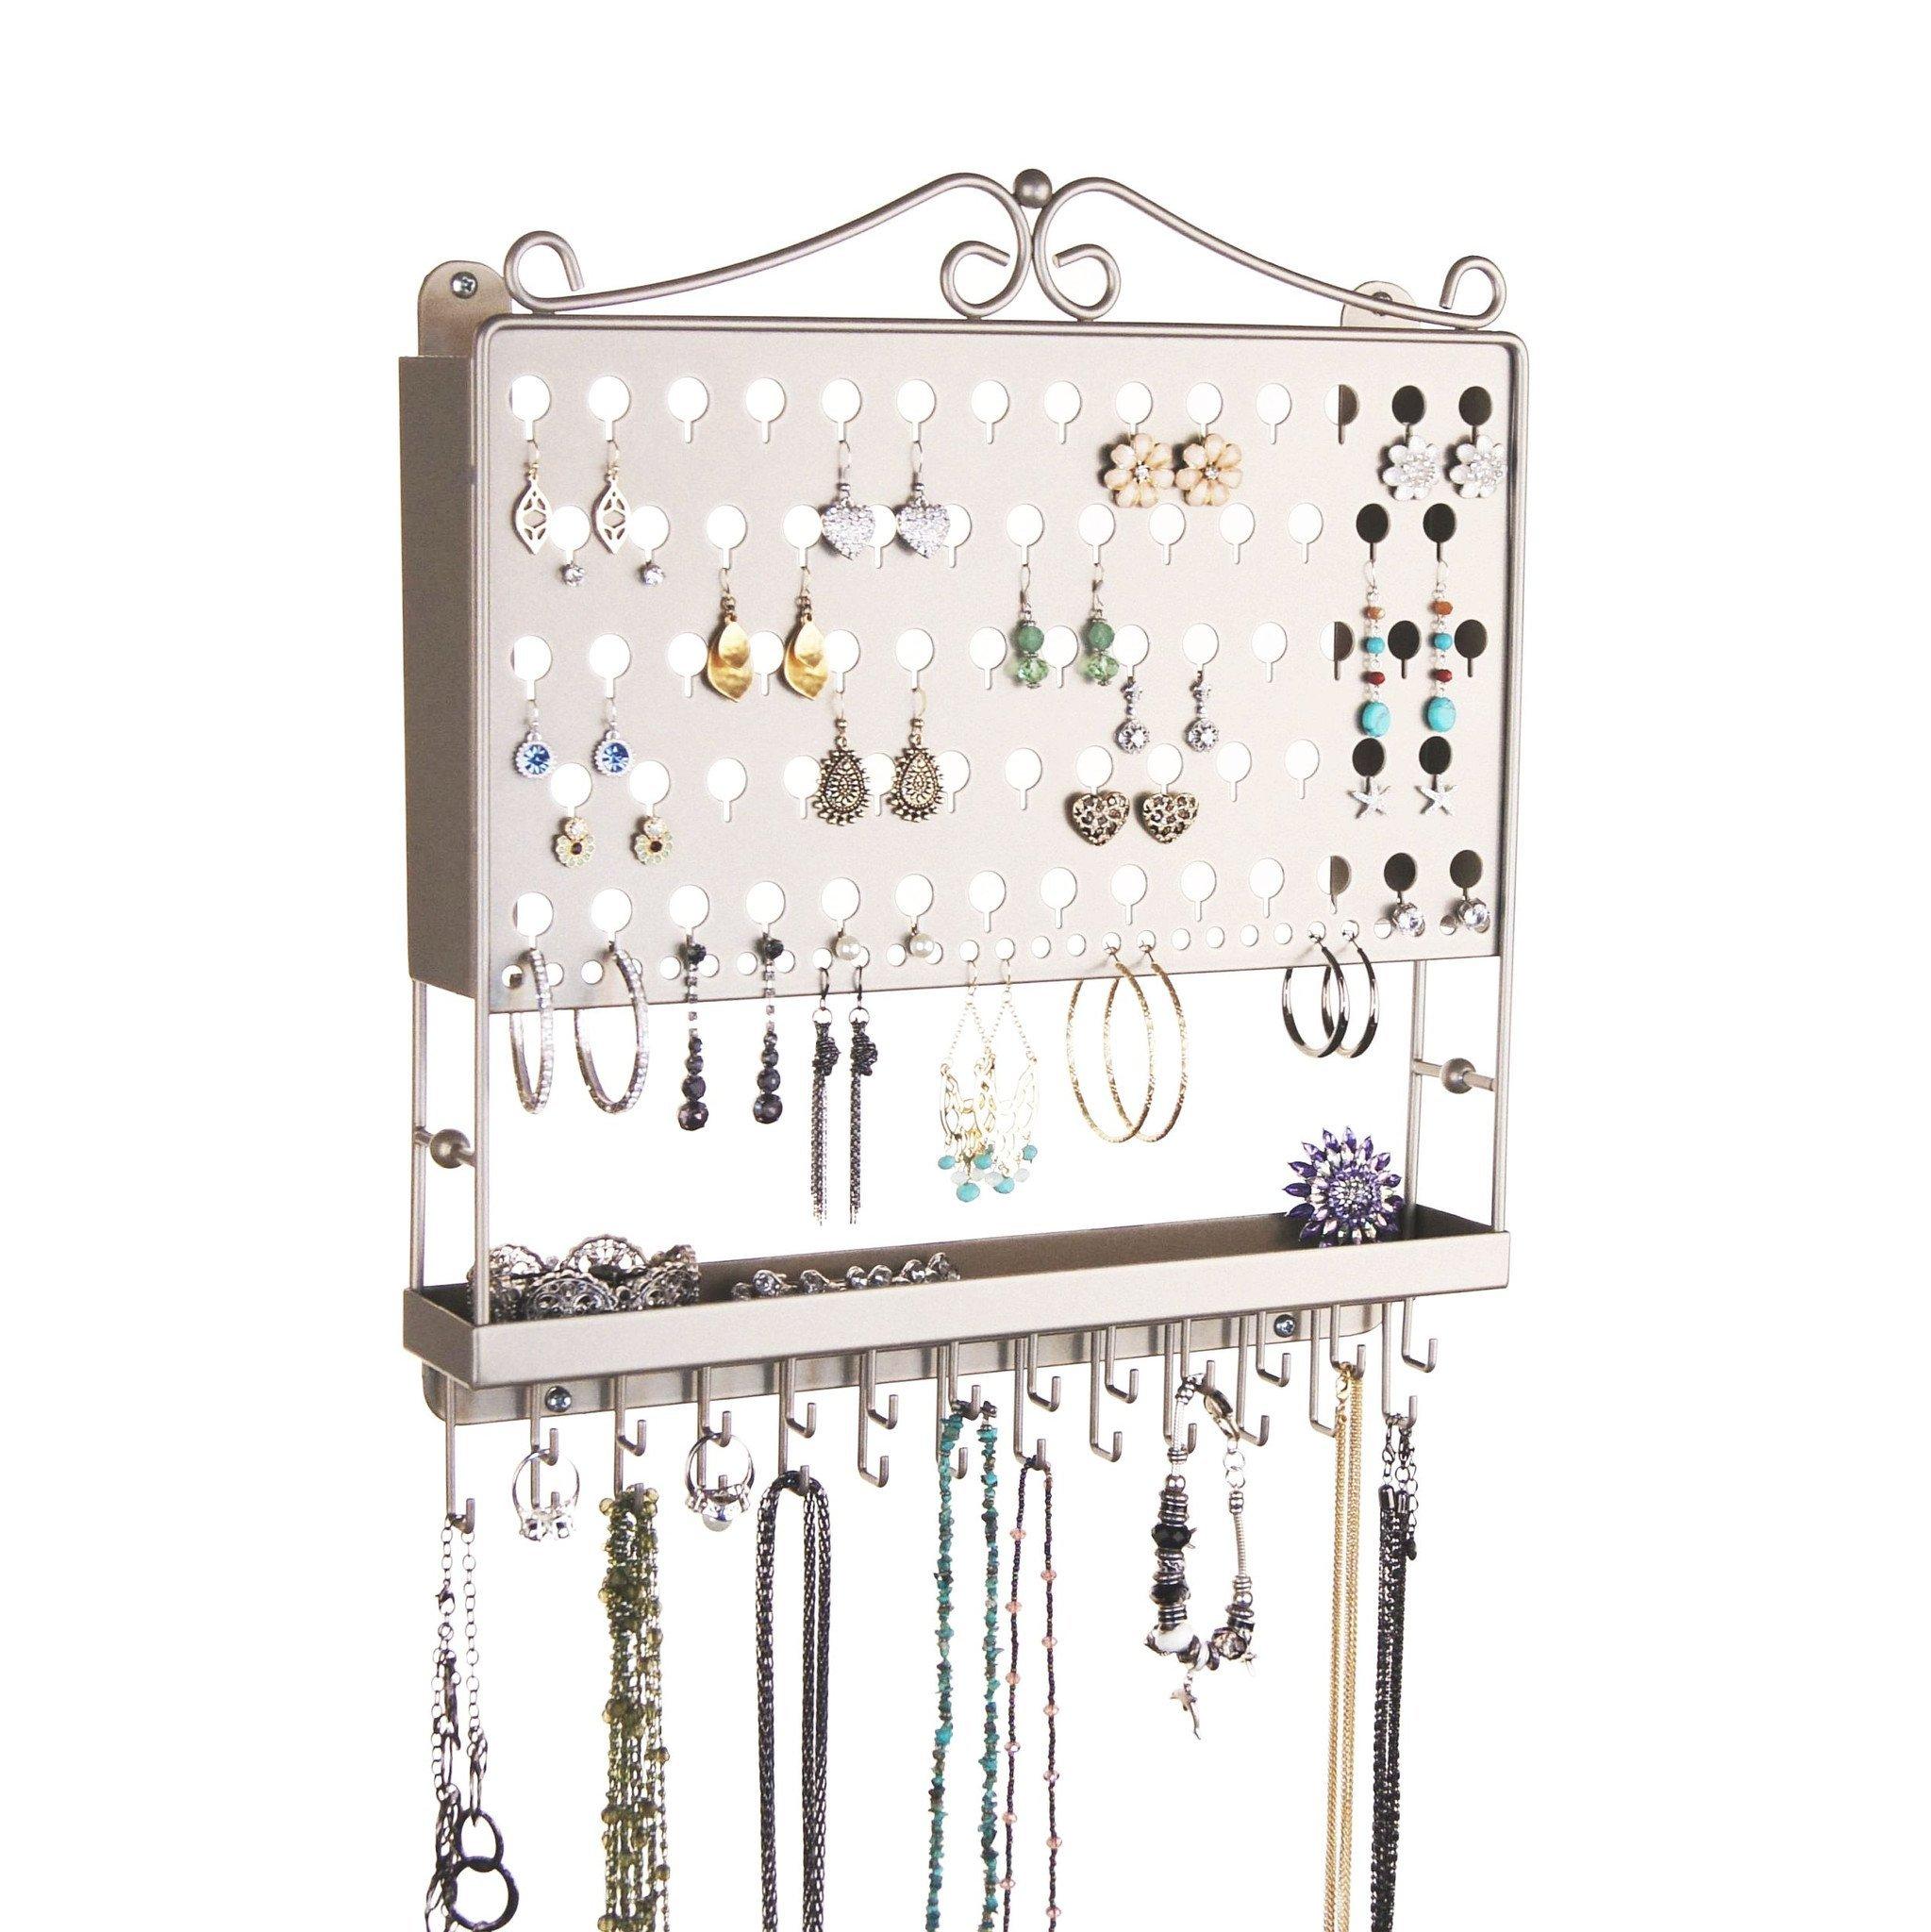 Jewelry Organizer Hanging Earring Holder Wall Mount Necklace Rack Bracelet Closet Storage, Satin Nickel Silver by Angelynn's Jewelry Organizers